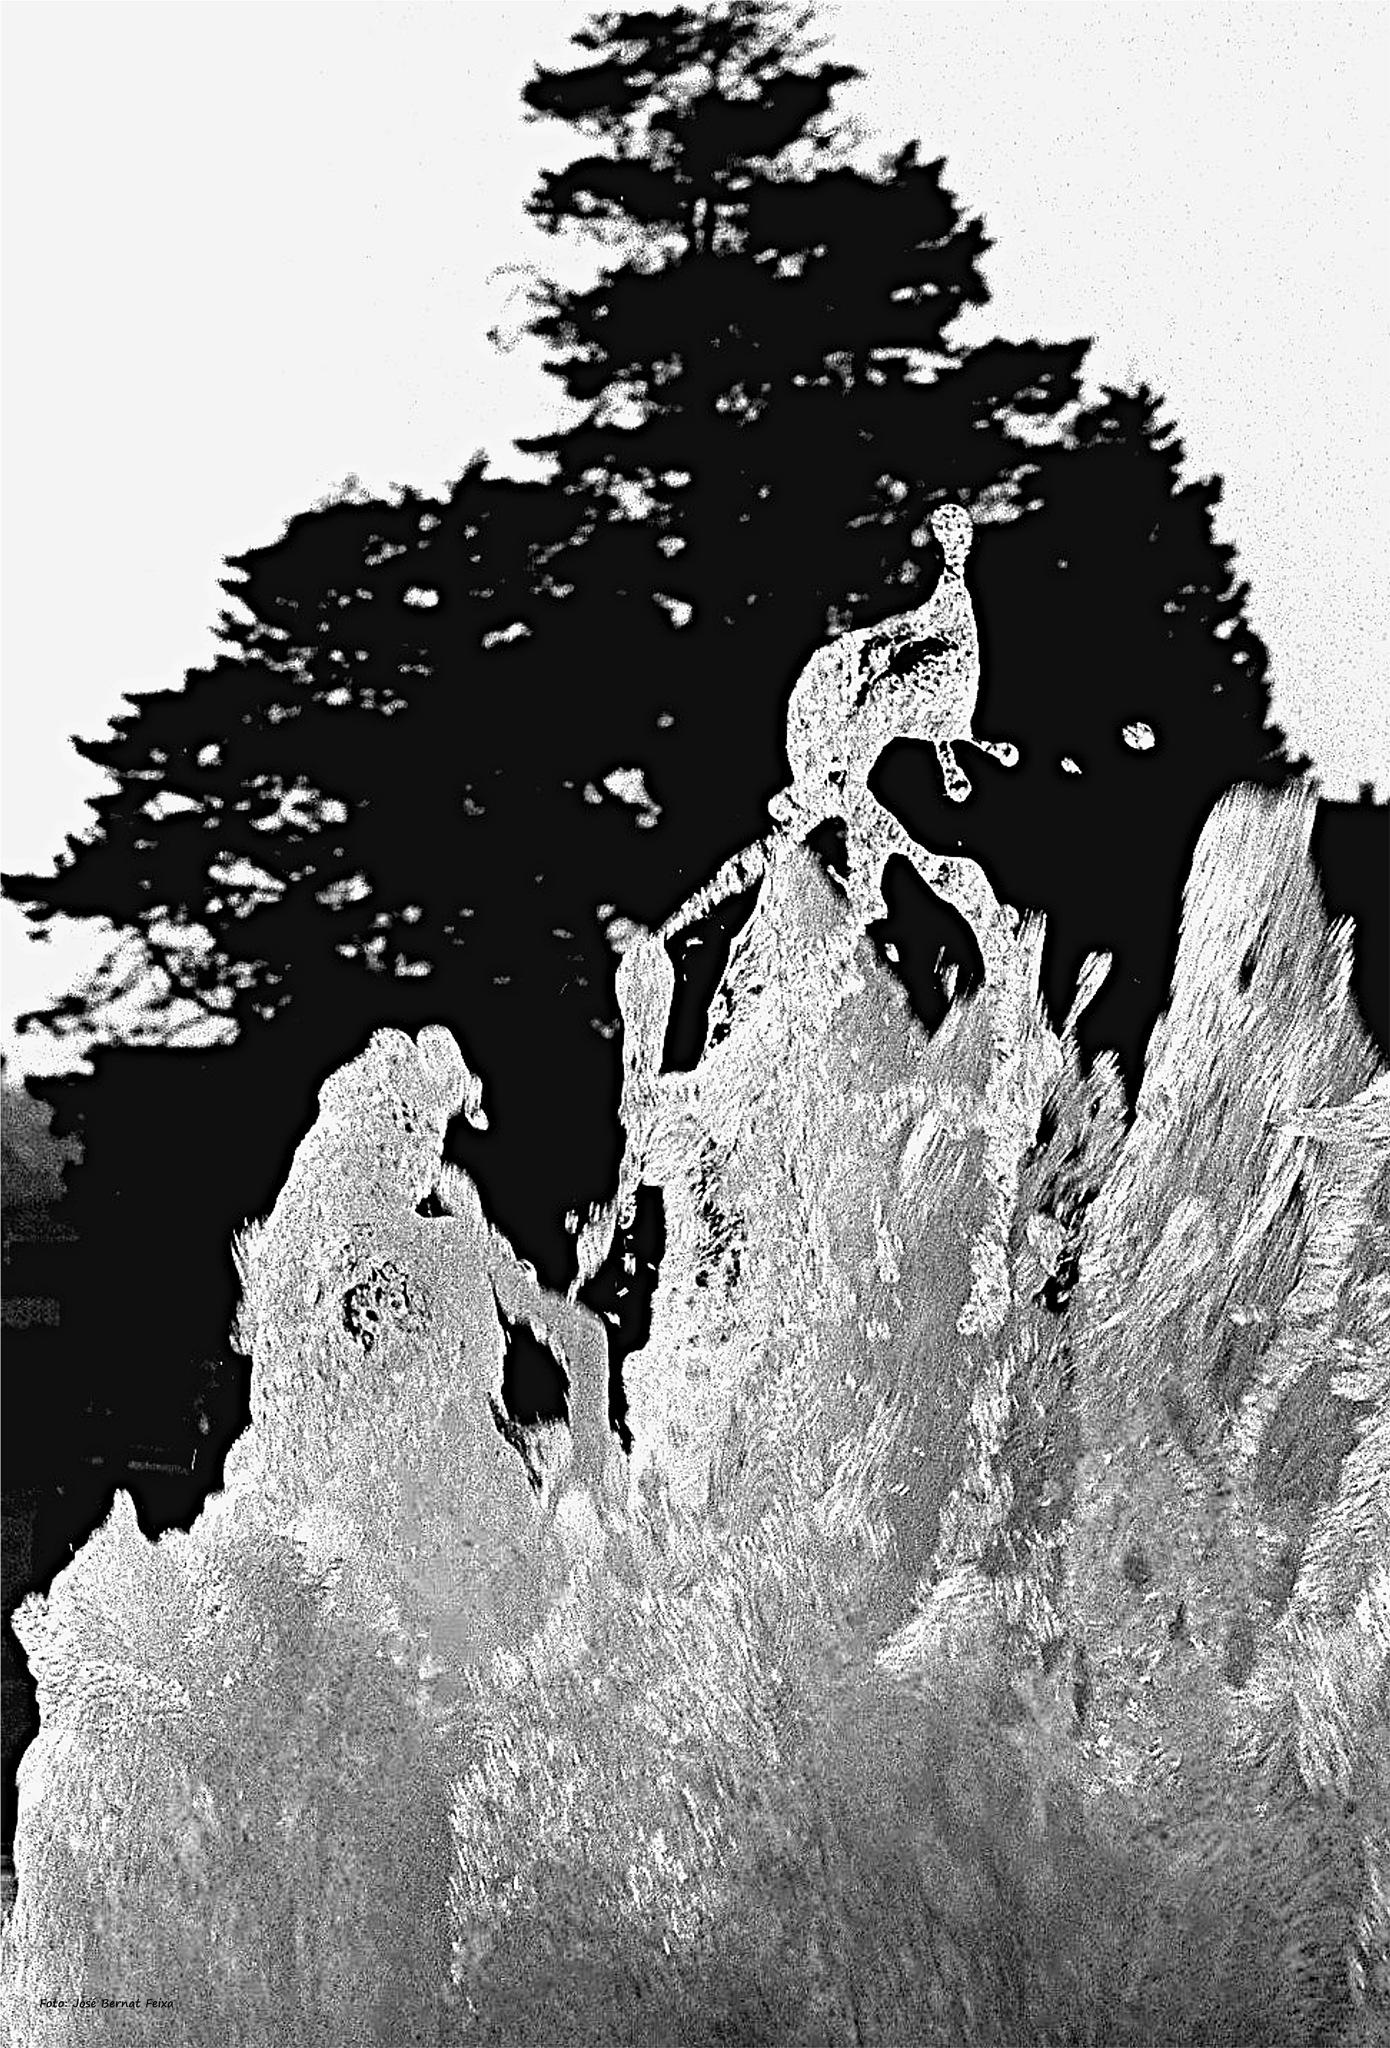 FUENTE DE AGUA; WATERFONTEIN; WATER FOUNTAIN (60's) by José Bernat Feixa